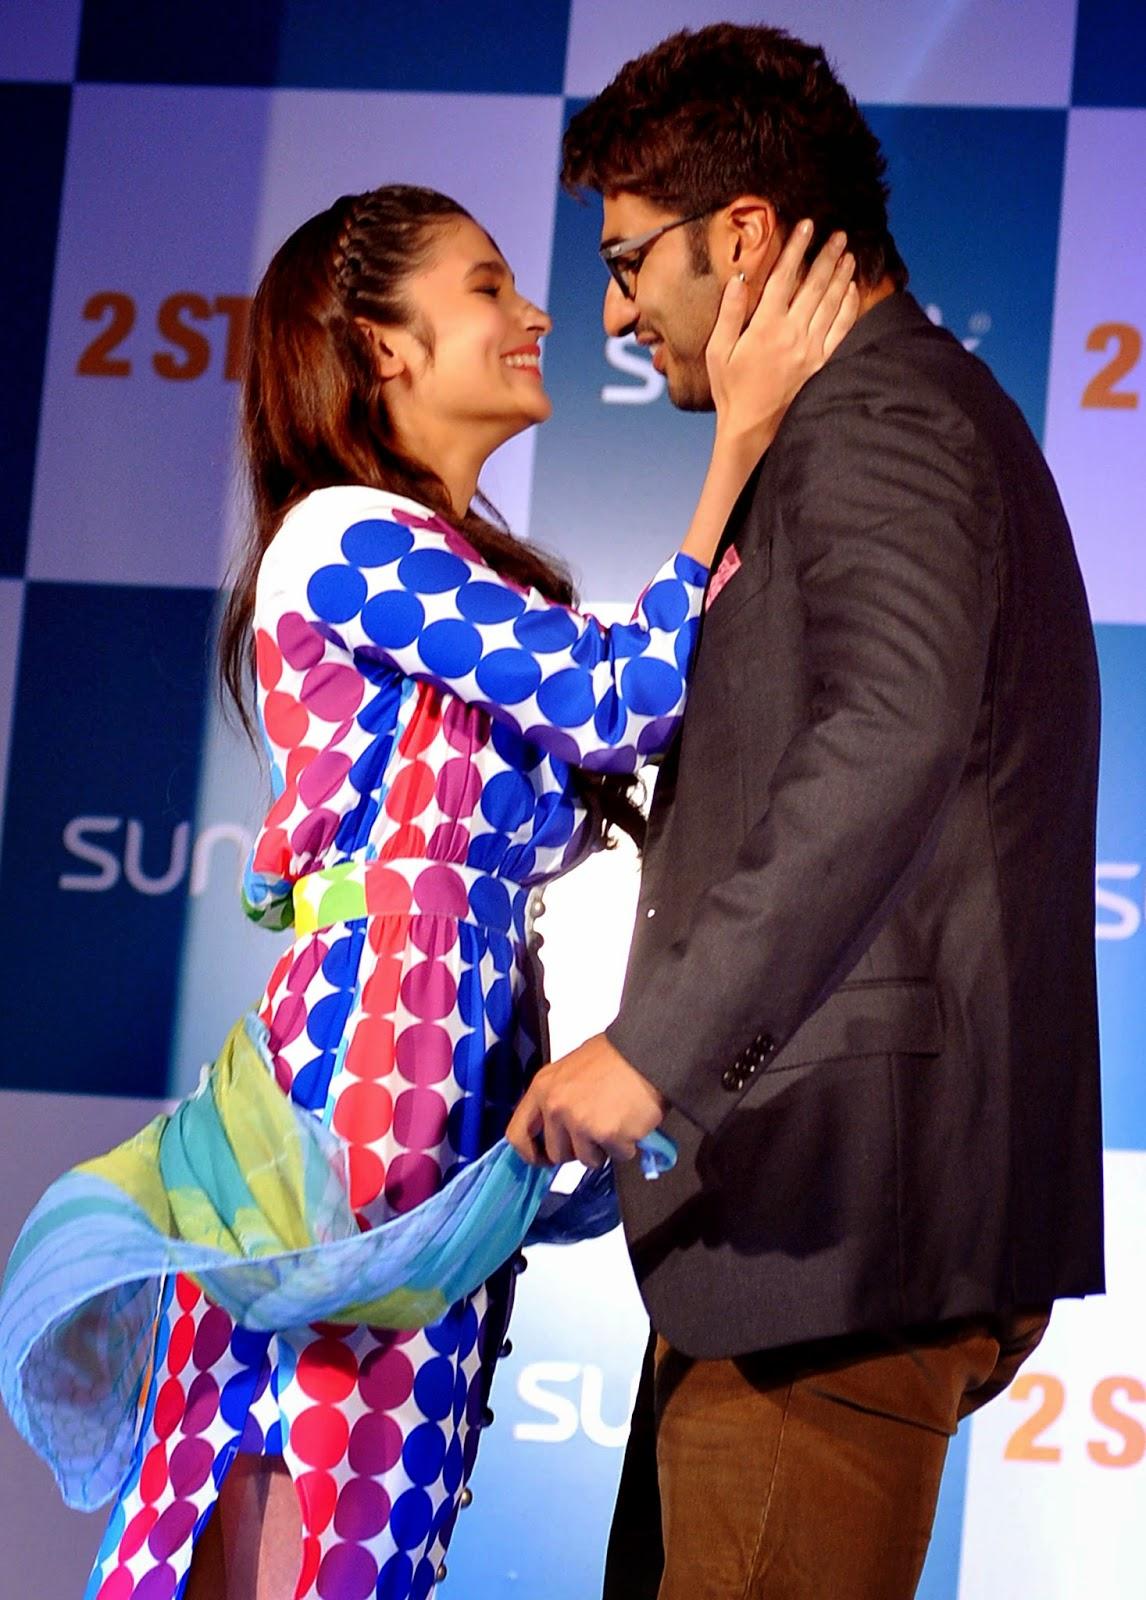 Actress, Alia and Arjun Love Affair, Alia Bhatt, Alia Bhatt and Arjun Kapoor, Arjun Kapoor, Bollywood, Daughter, Film 2014, Karan Johar, Kissing Scenes, Love Affair, Mahesh Bhatt, Movies, Two States,